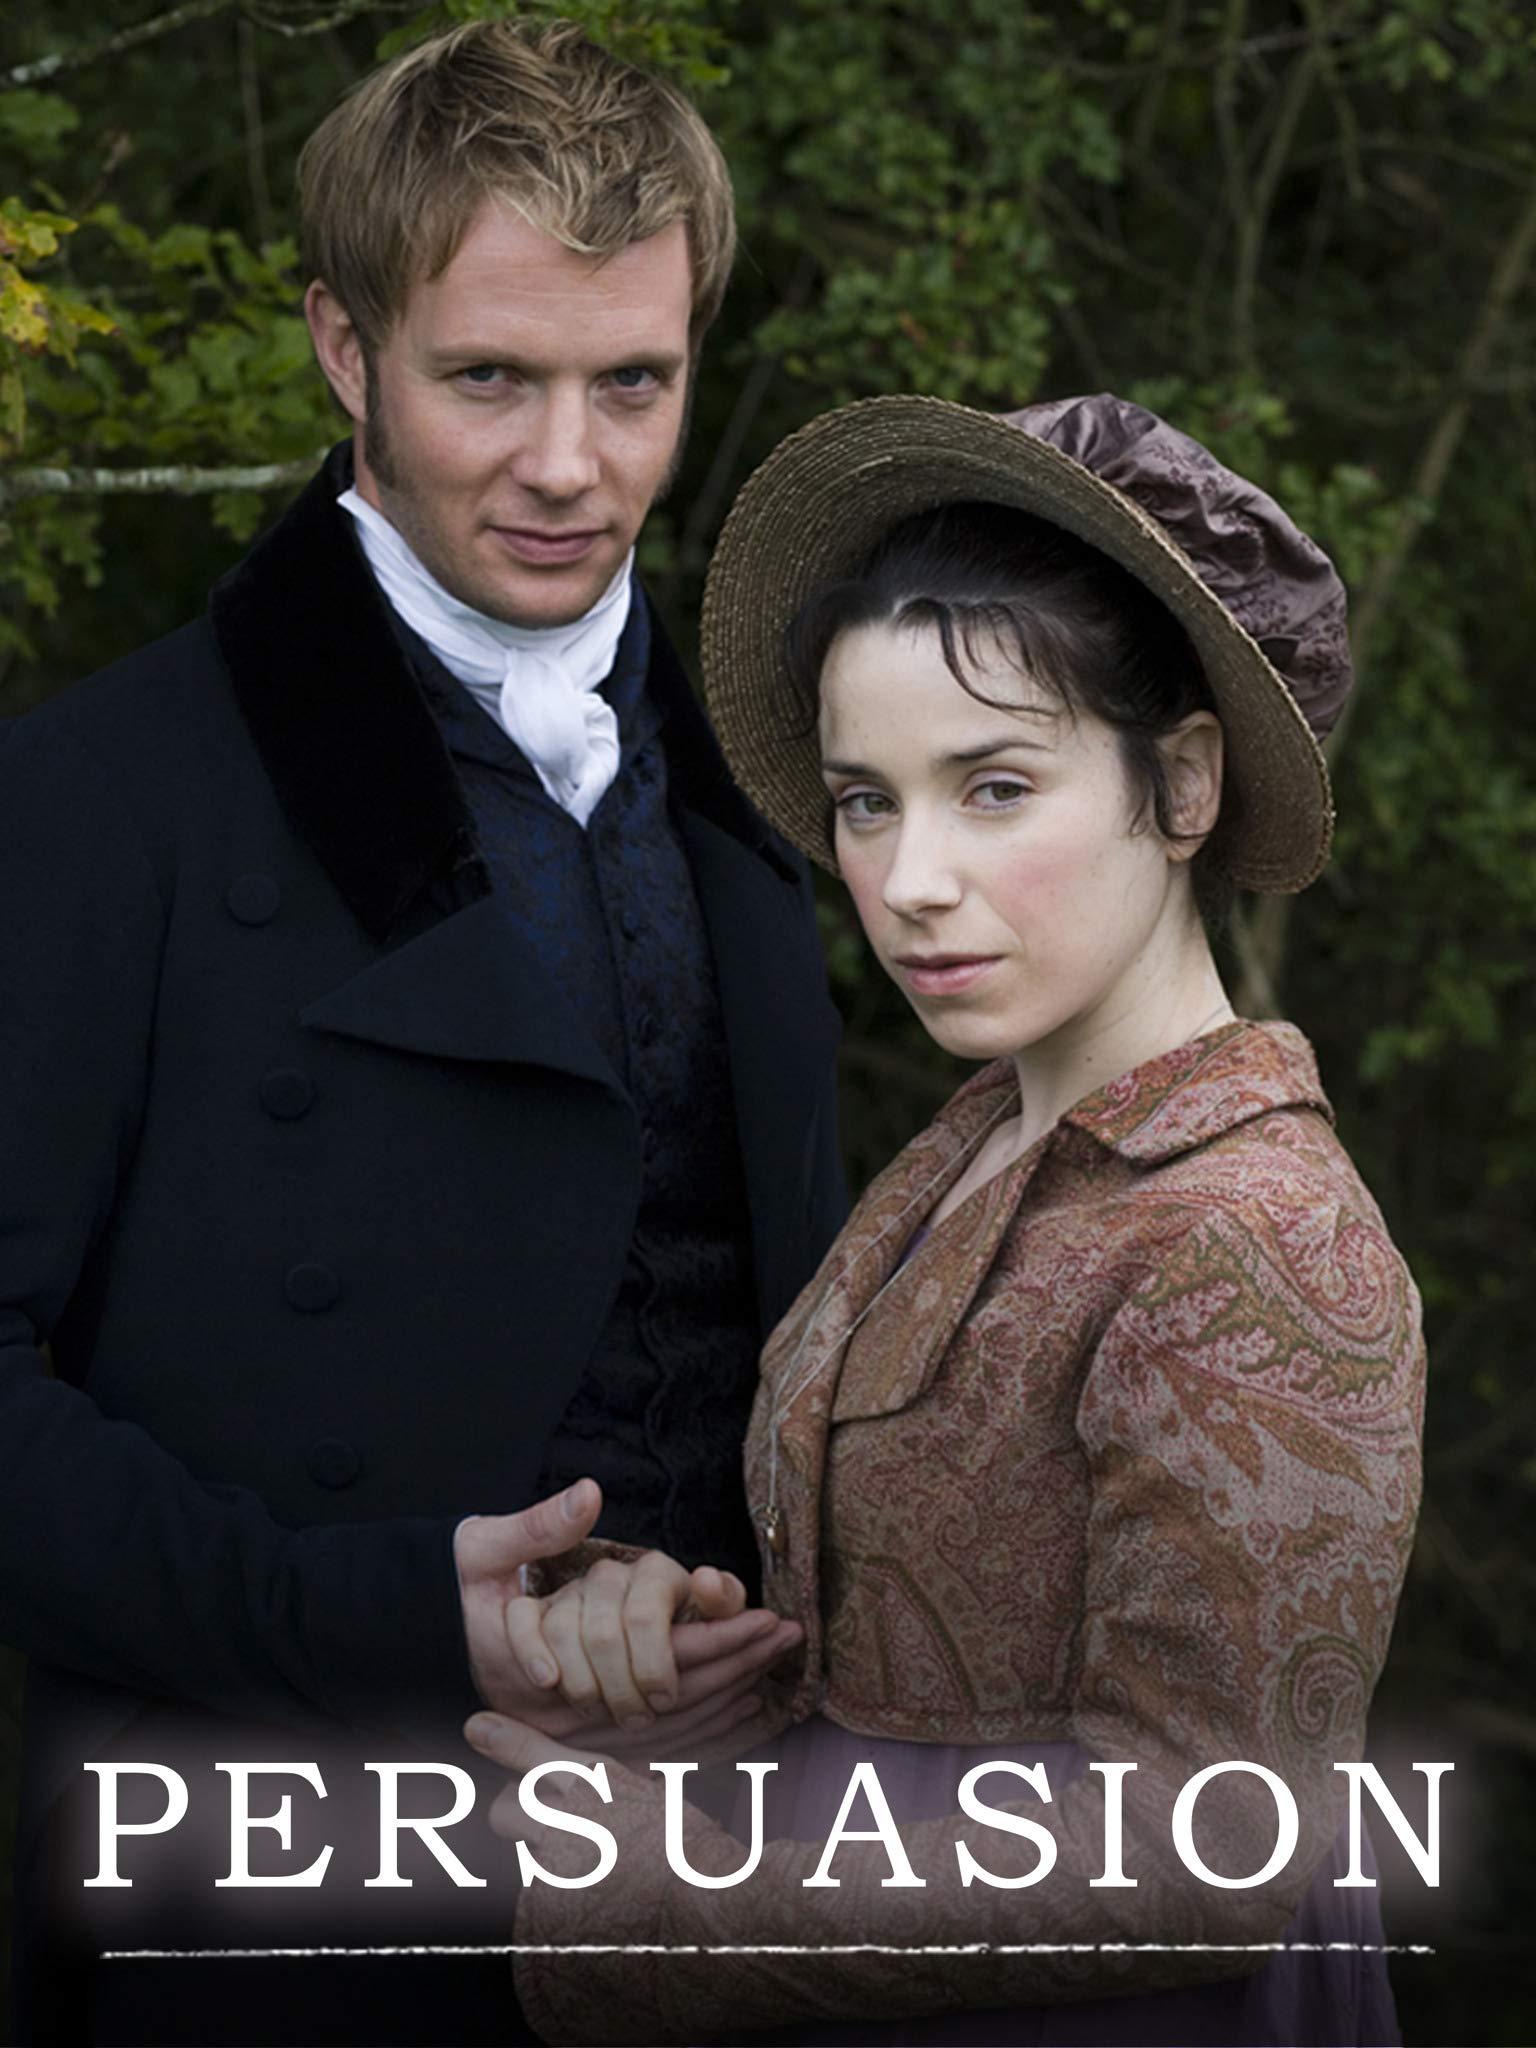 Persuasion Movie Where To Watch